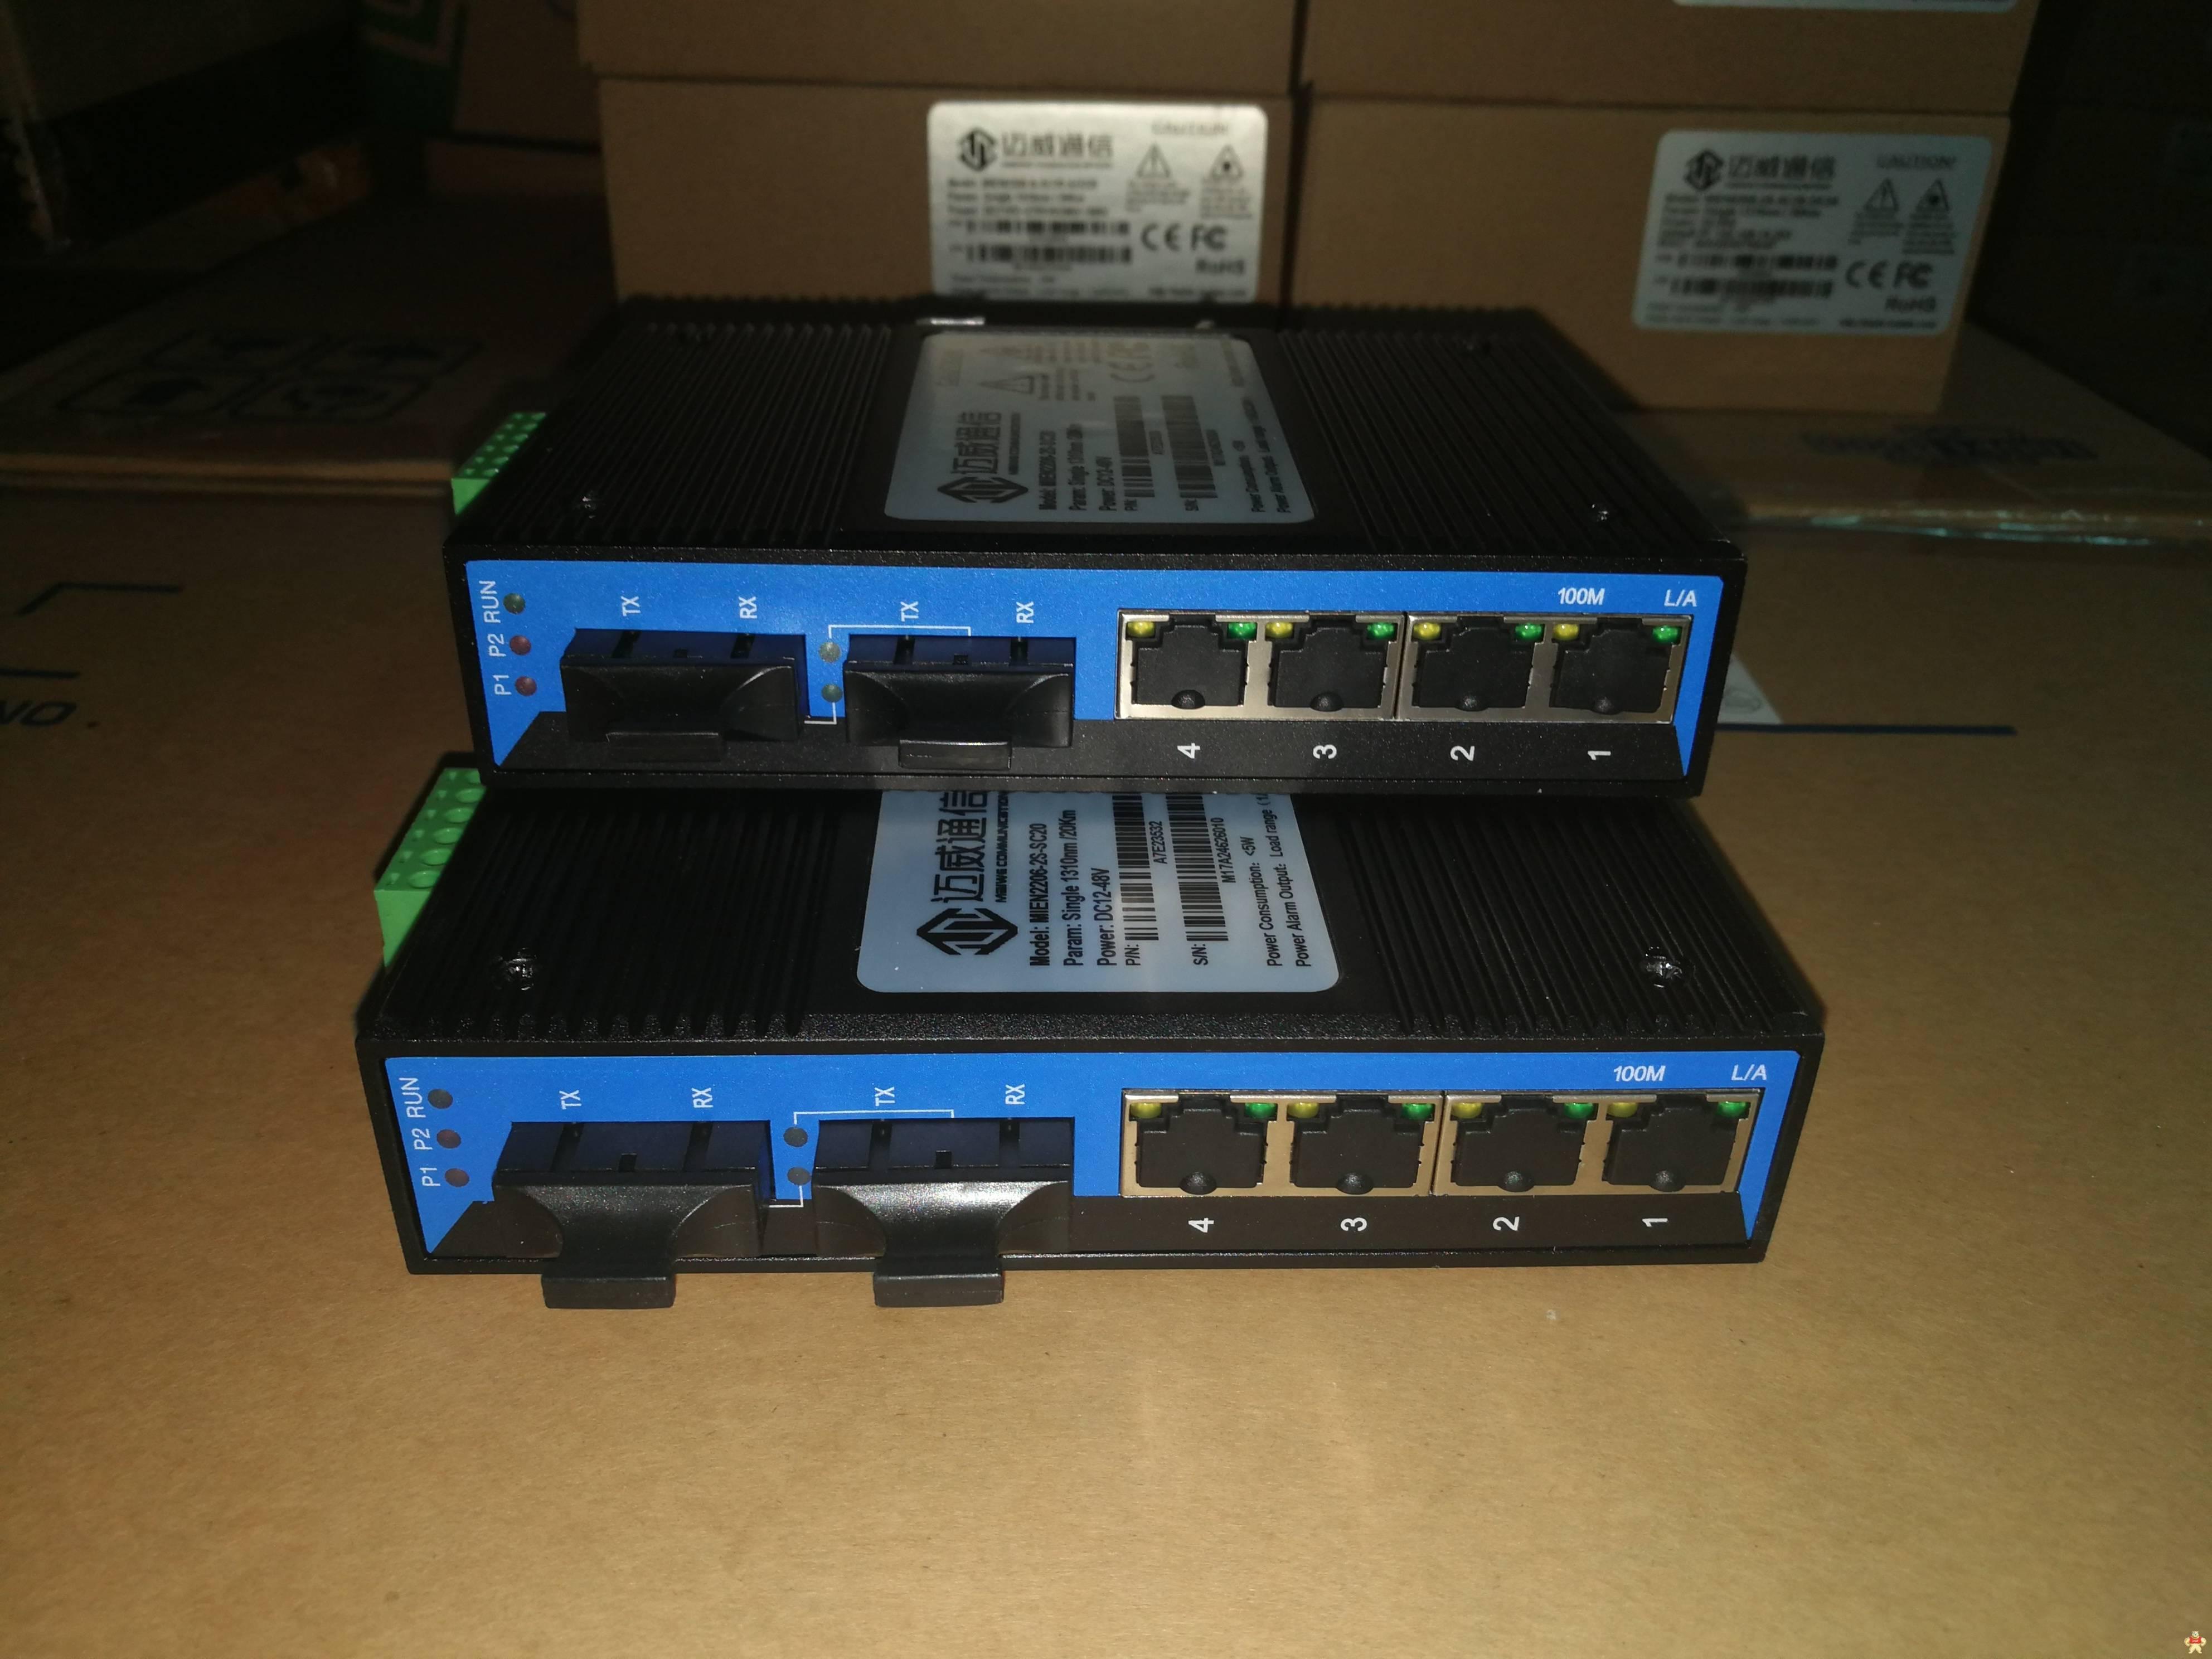 MIEN2206-2S-SC20迈威MAIWE工业交换机 MIEN2206-2S-SC20,MIEN2206,迈威MAIWE,MIEN2206-2S,迈威工业交换机